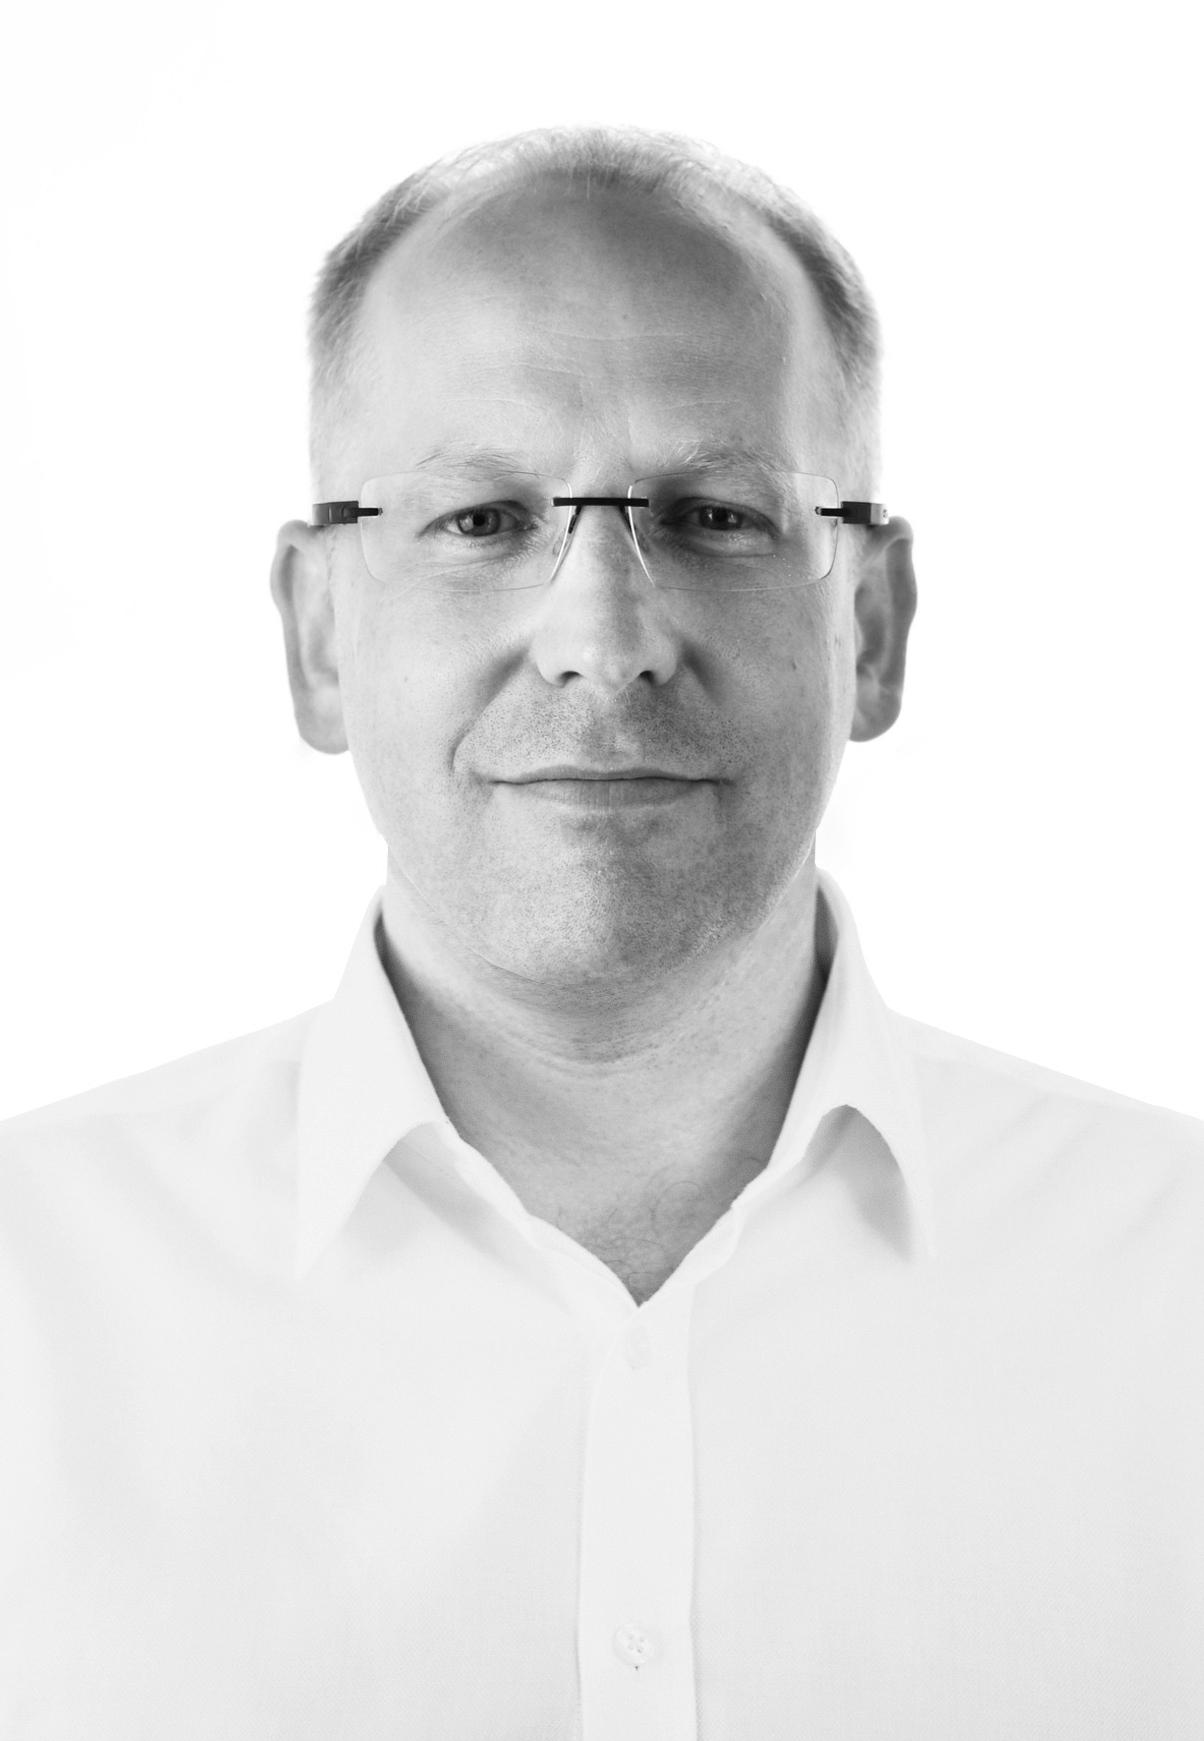 Lukasz Gorka